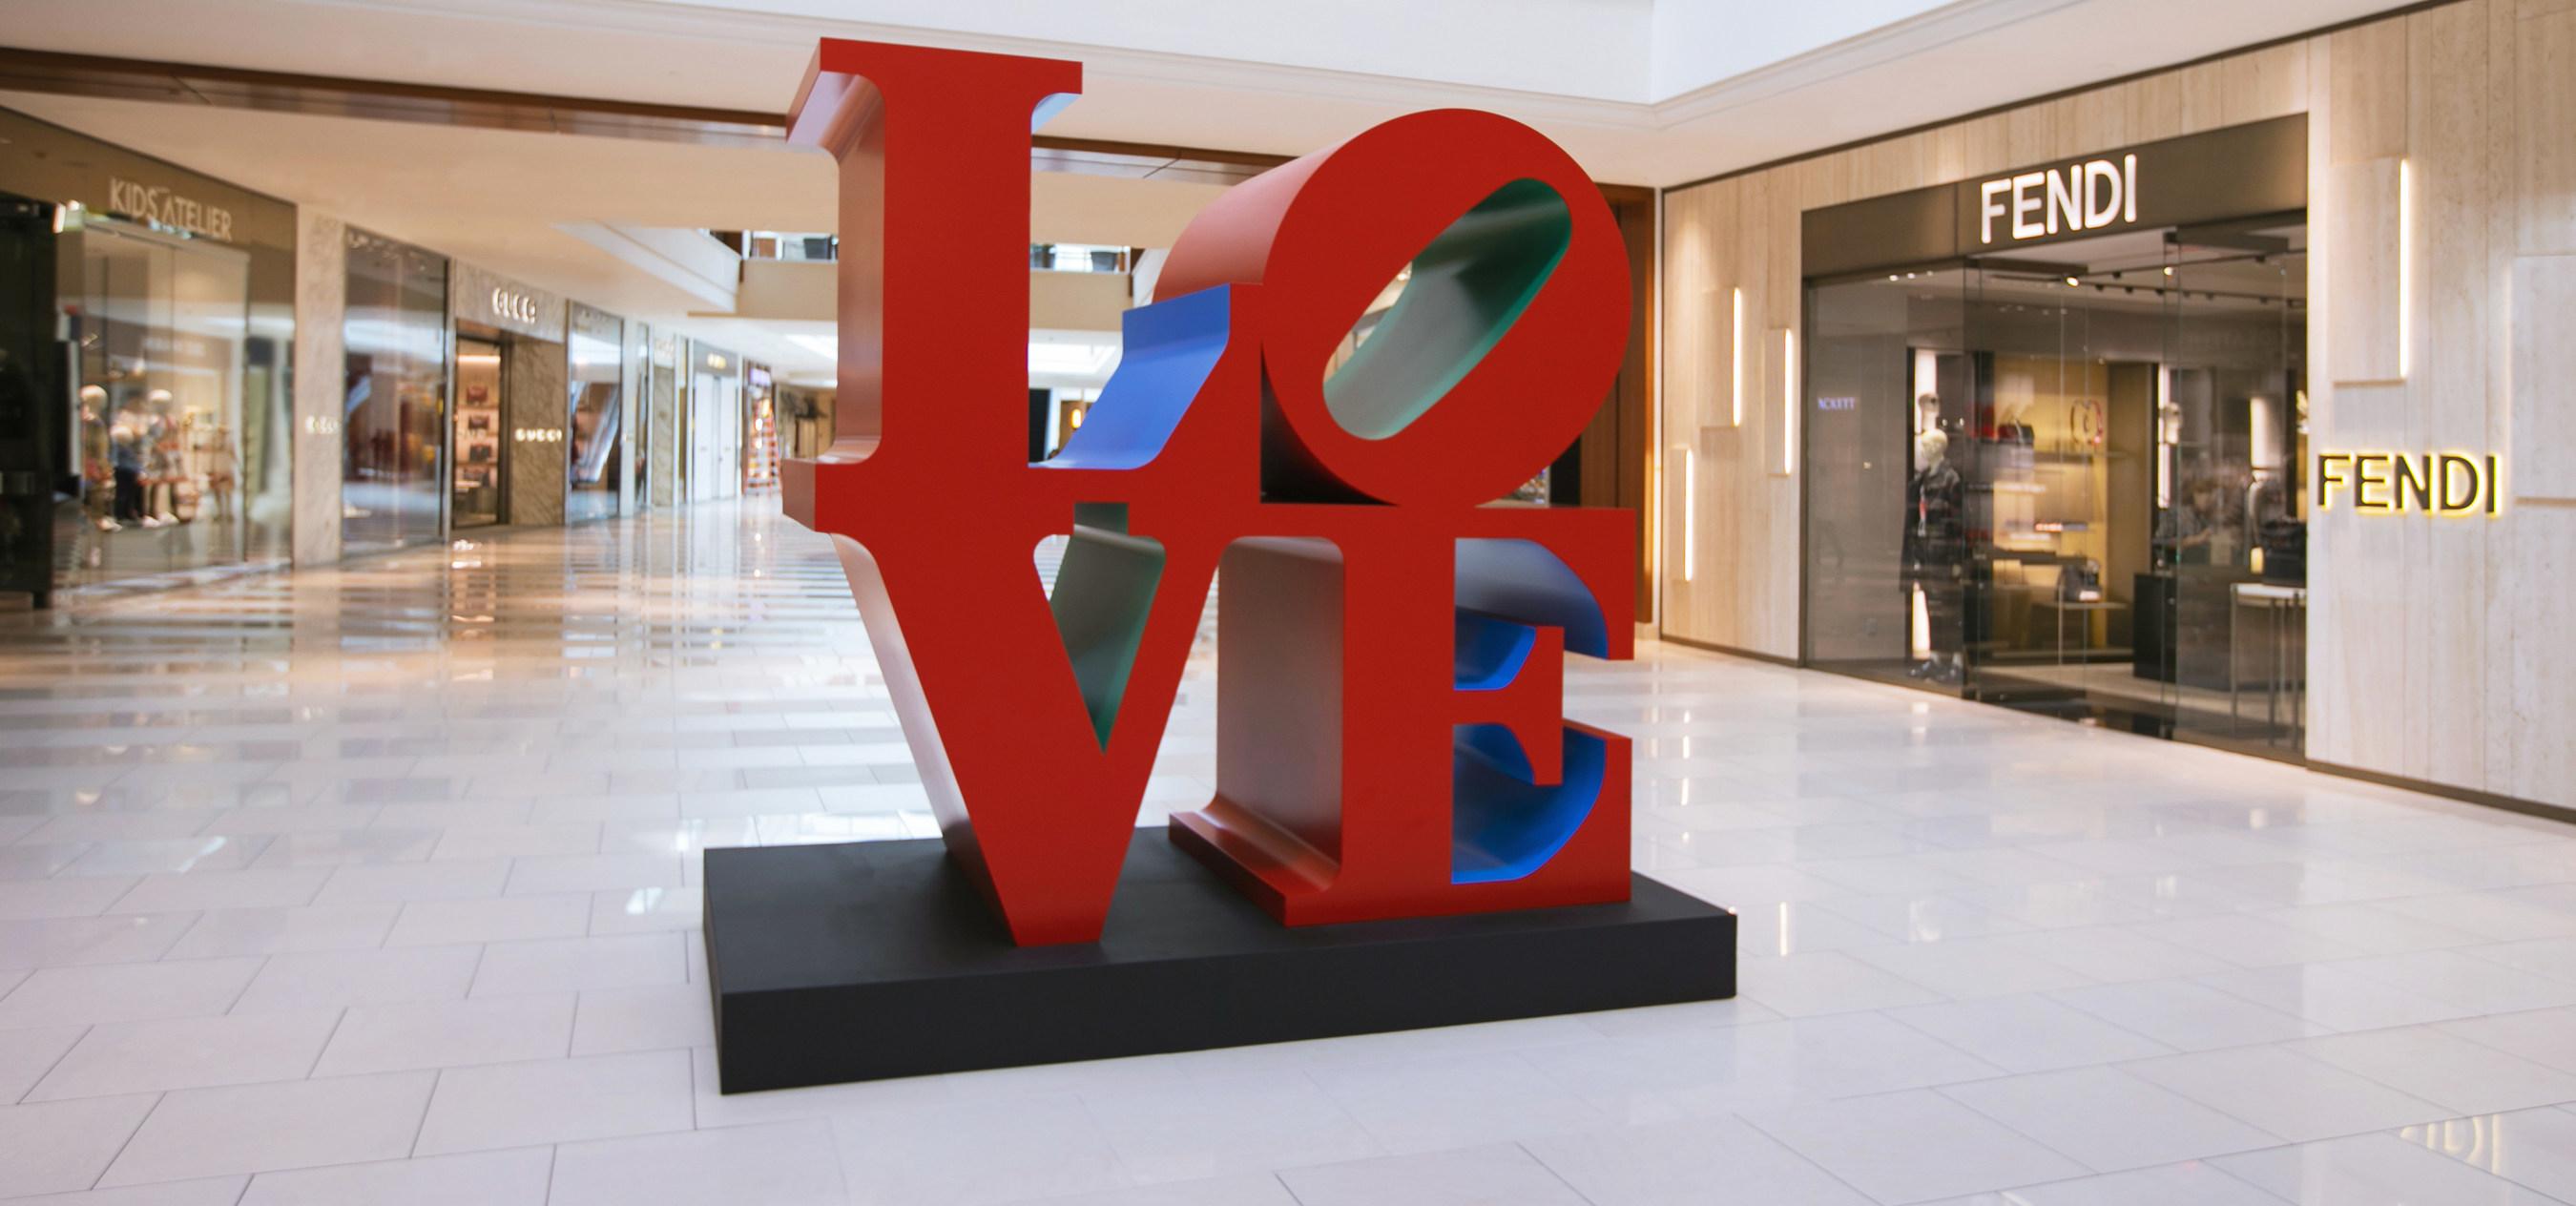 LOVE Sculpture by Robert Indiana at Aventura Mall